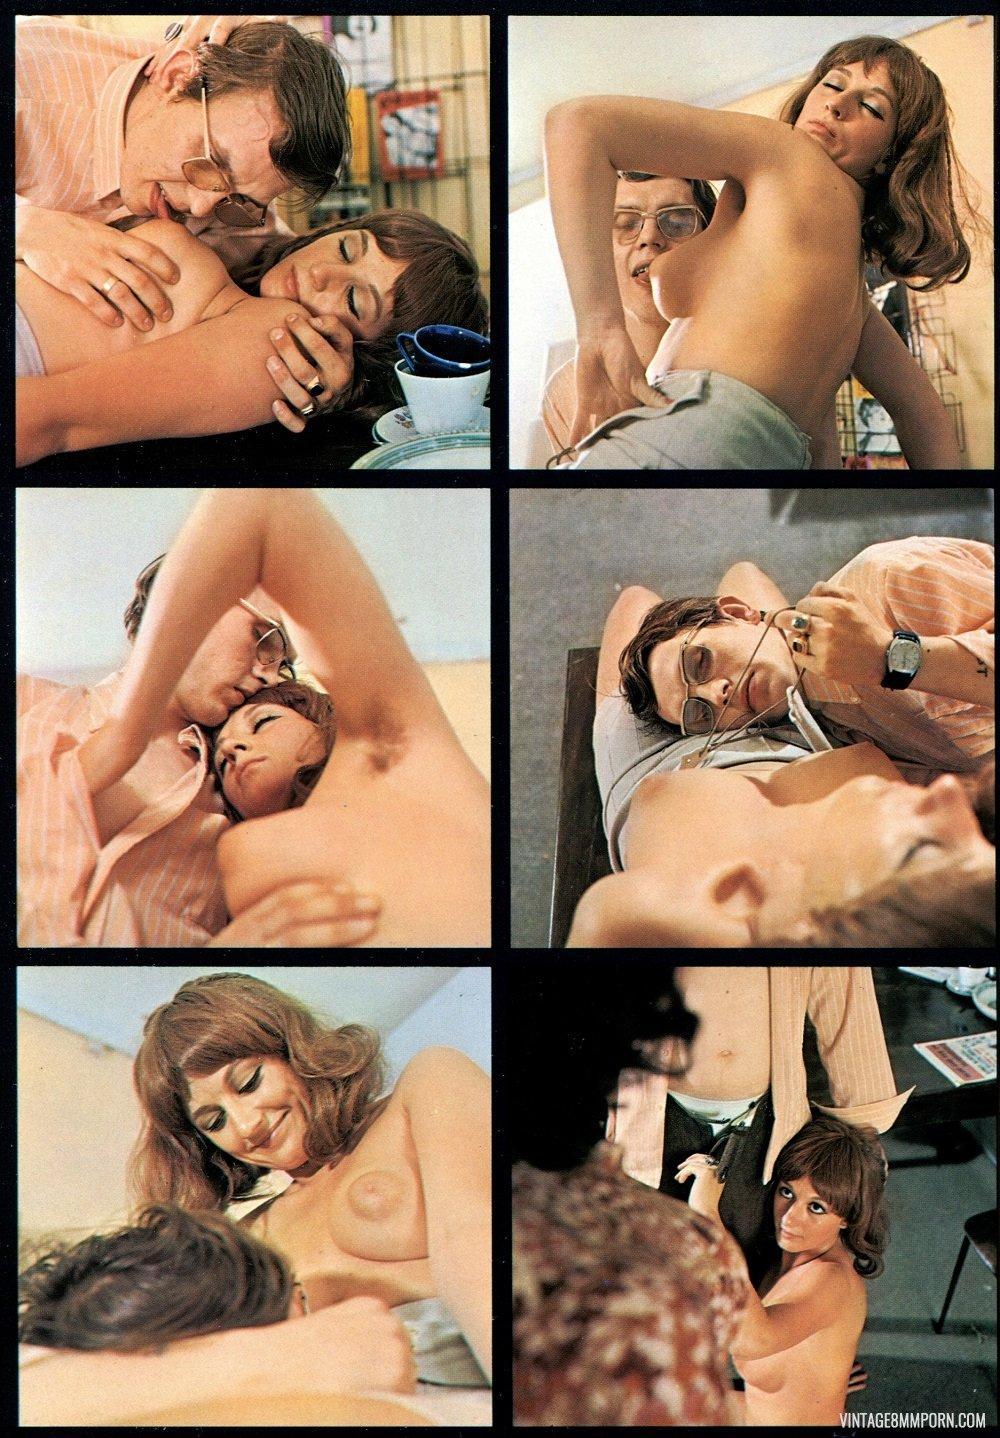 8Mm 2 Porn weekend sex color 27 vintage 8mm porn 8mm sex films | cloudy